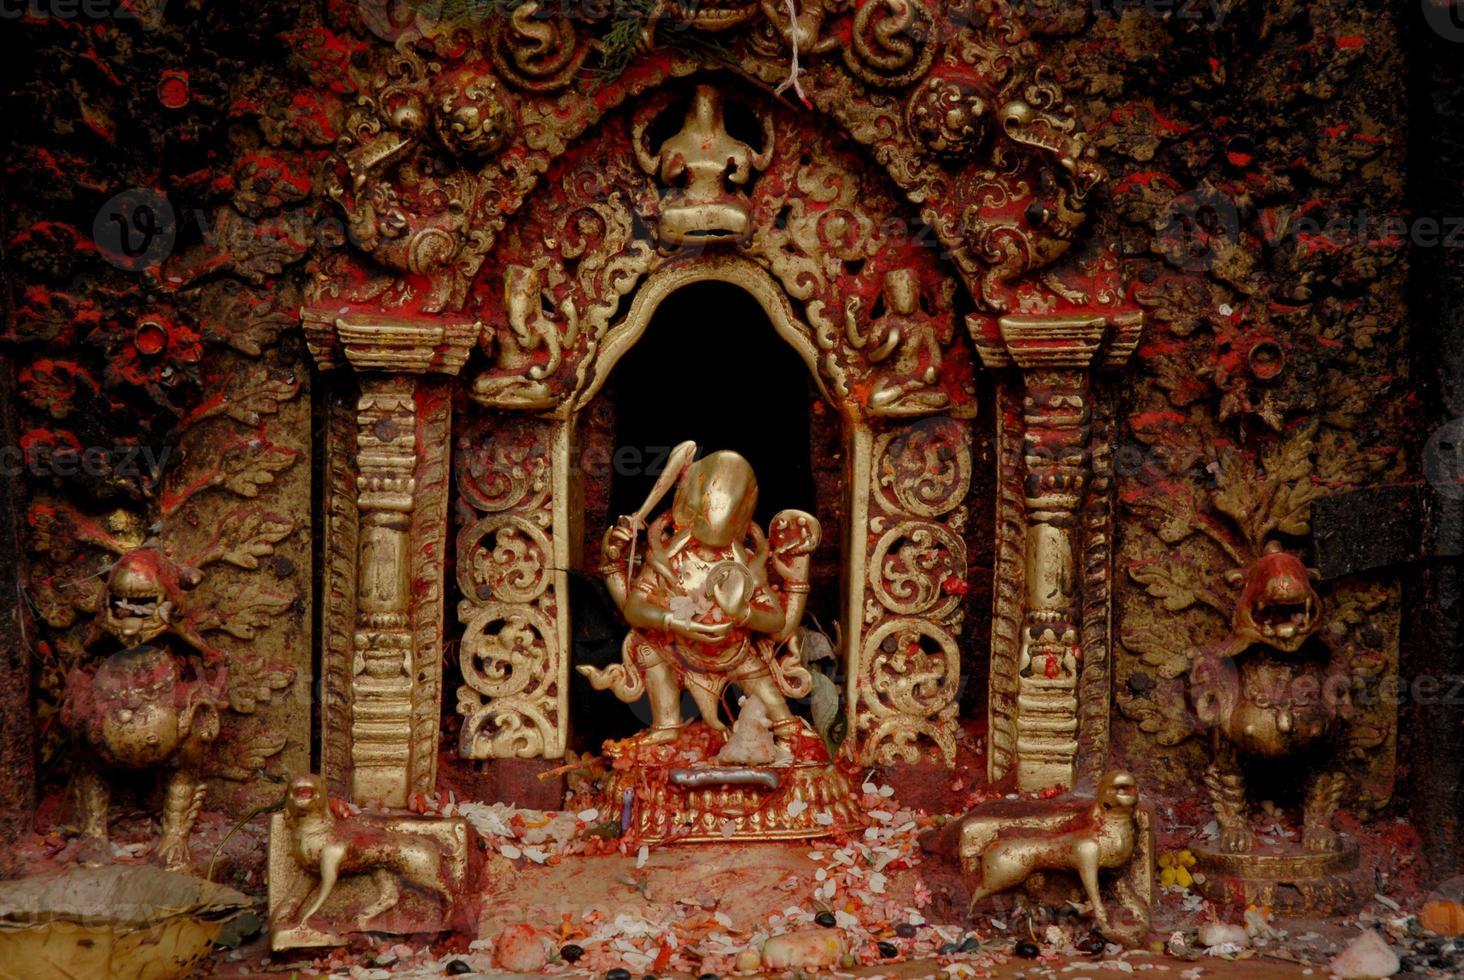 Dea bronzea al tempio indù in Nepal. foto